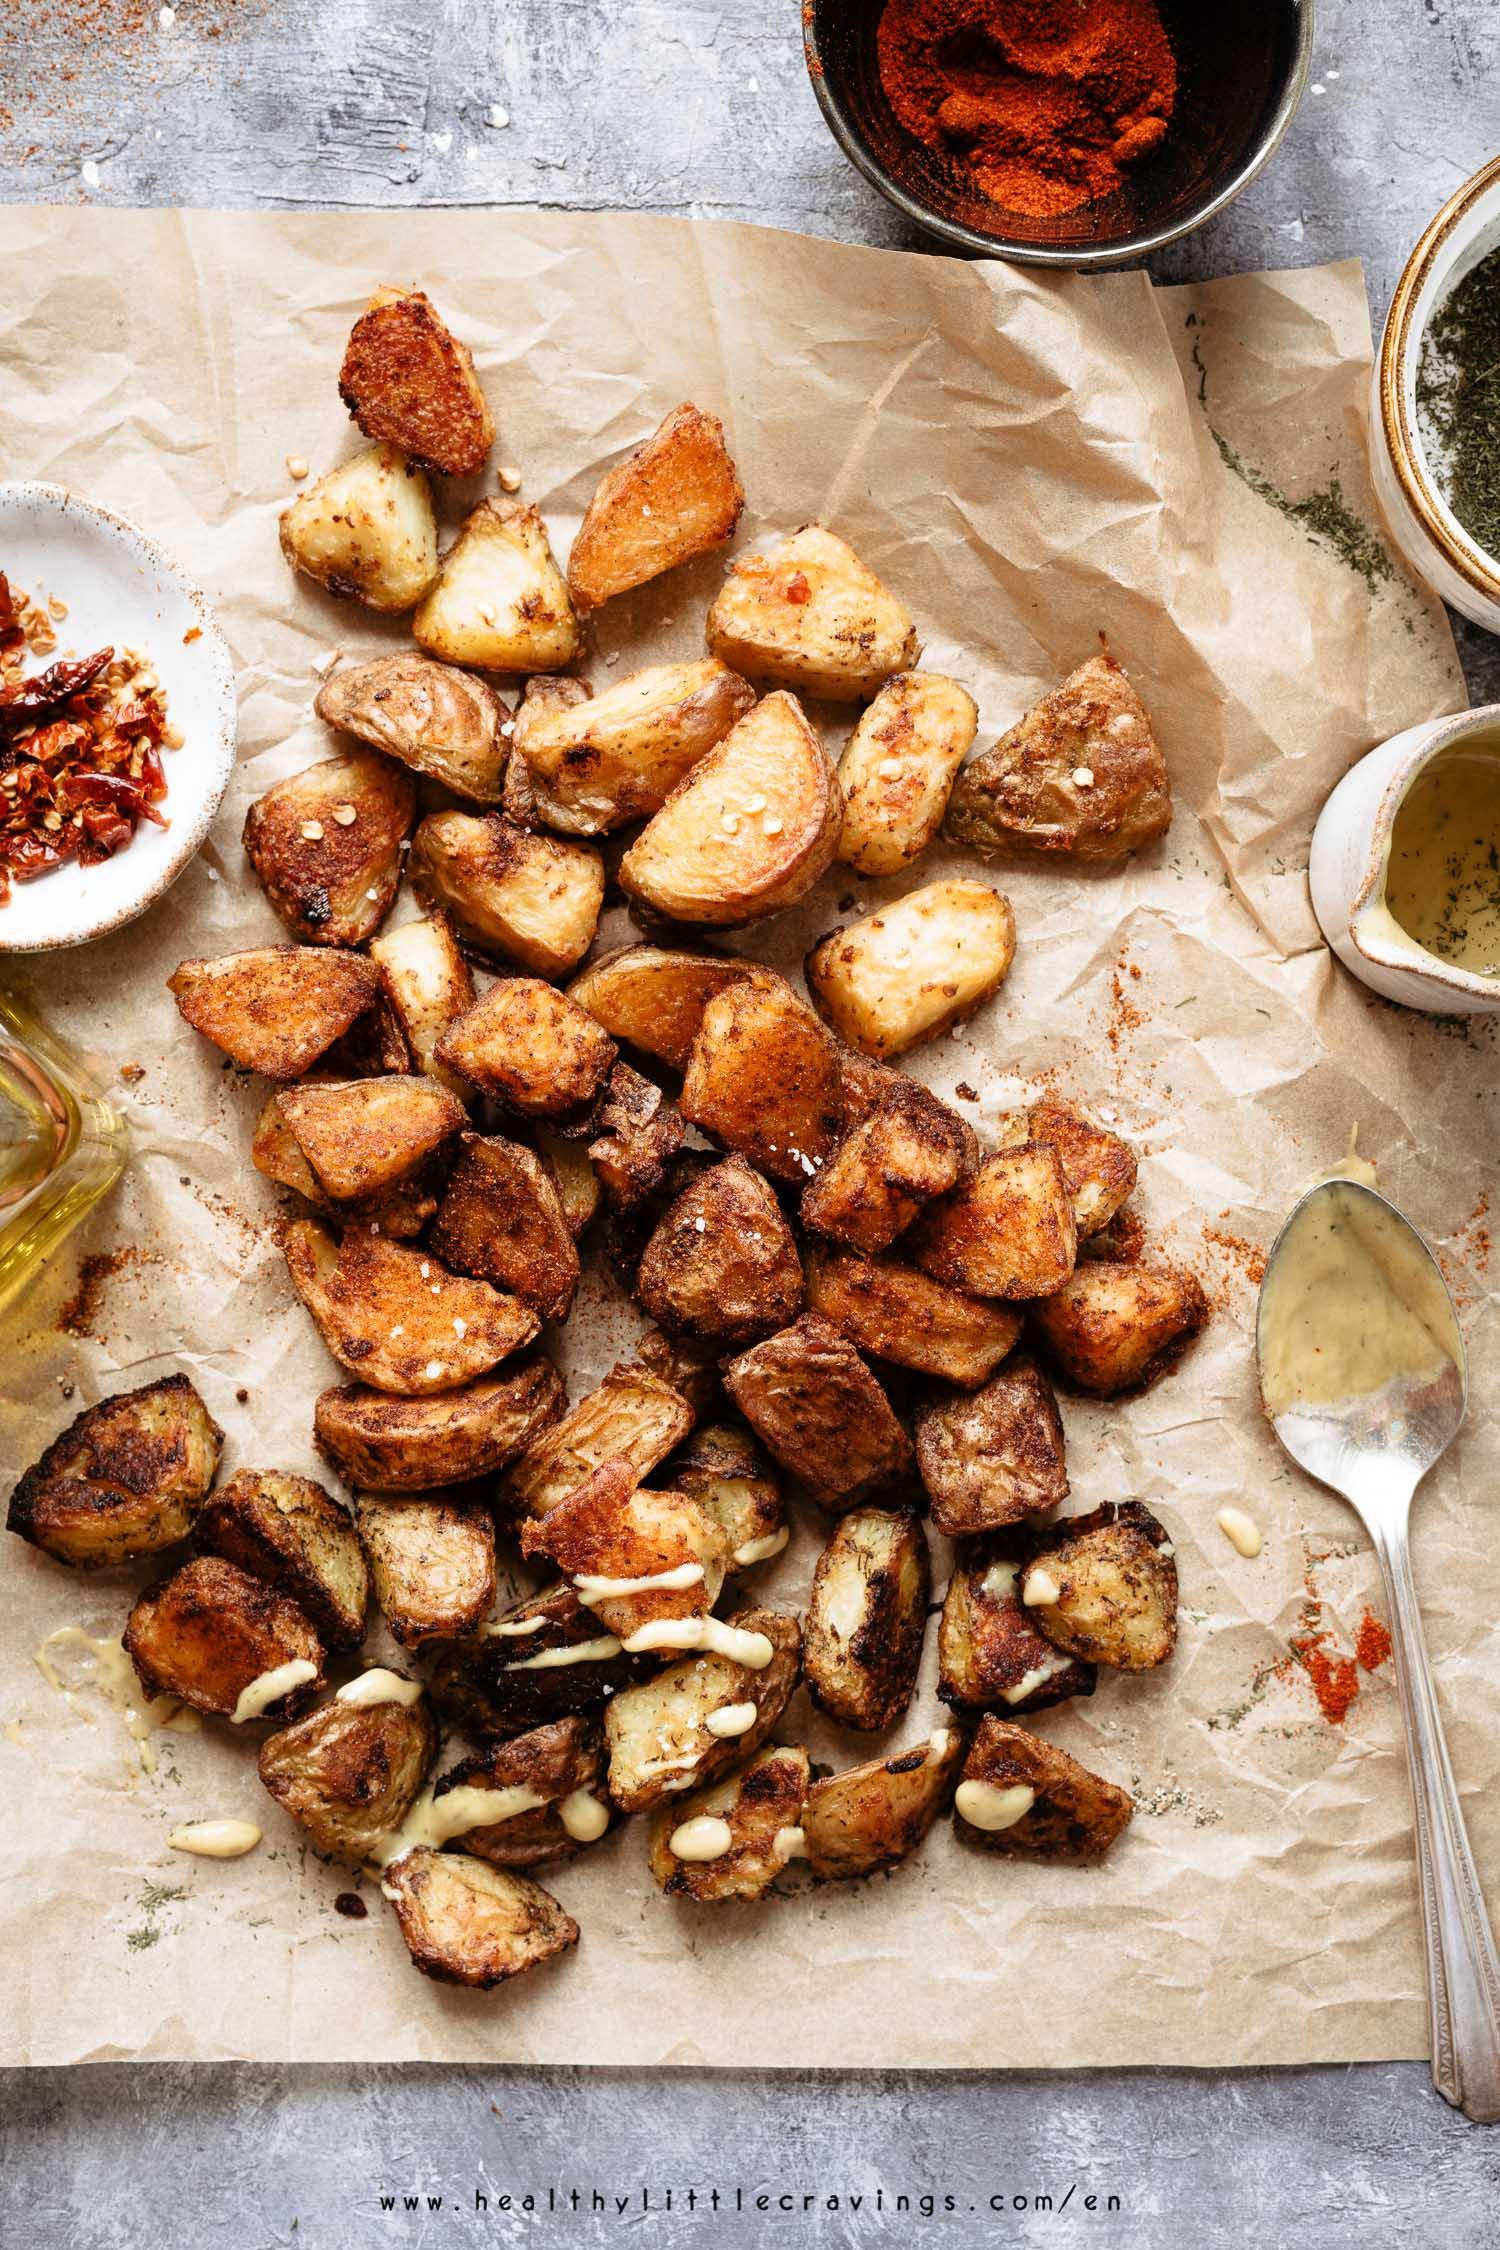 3 ways to make roasted potatoes